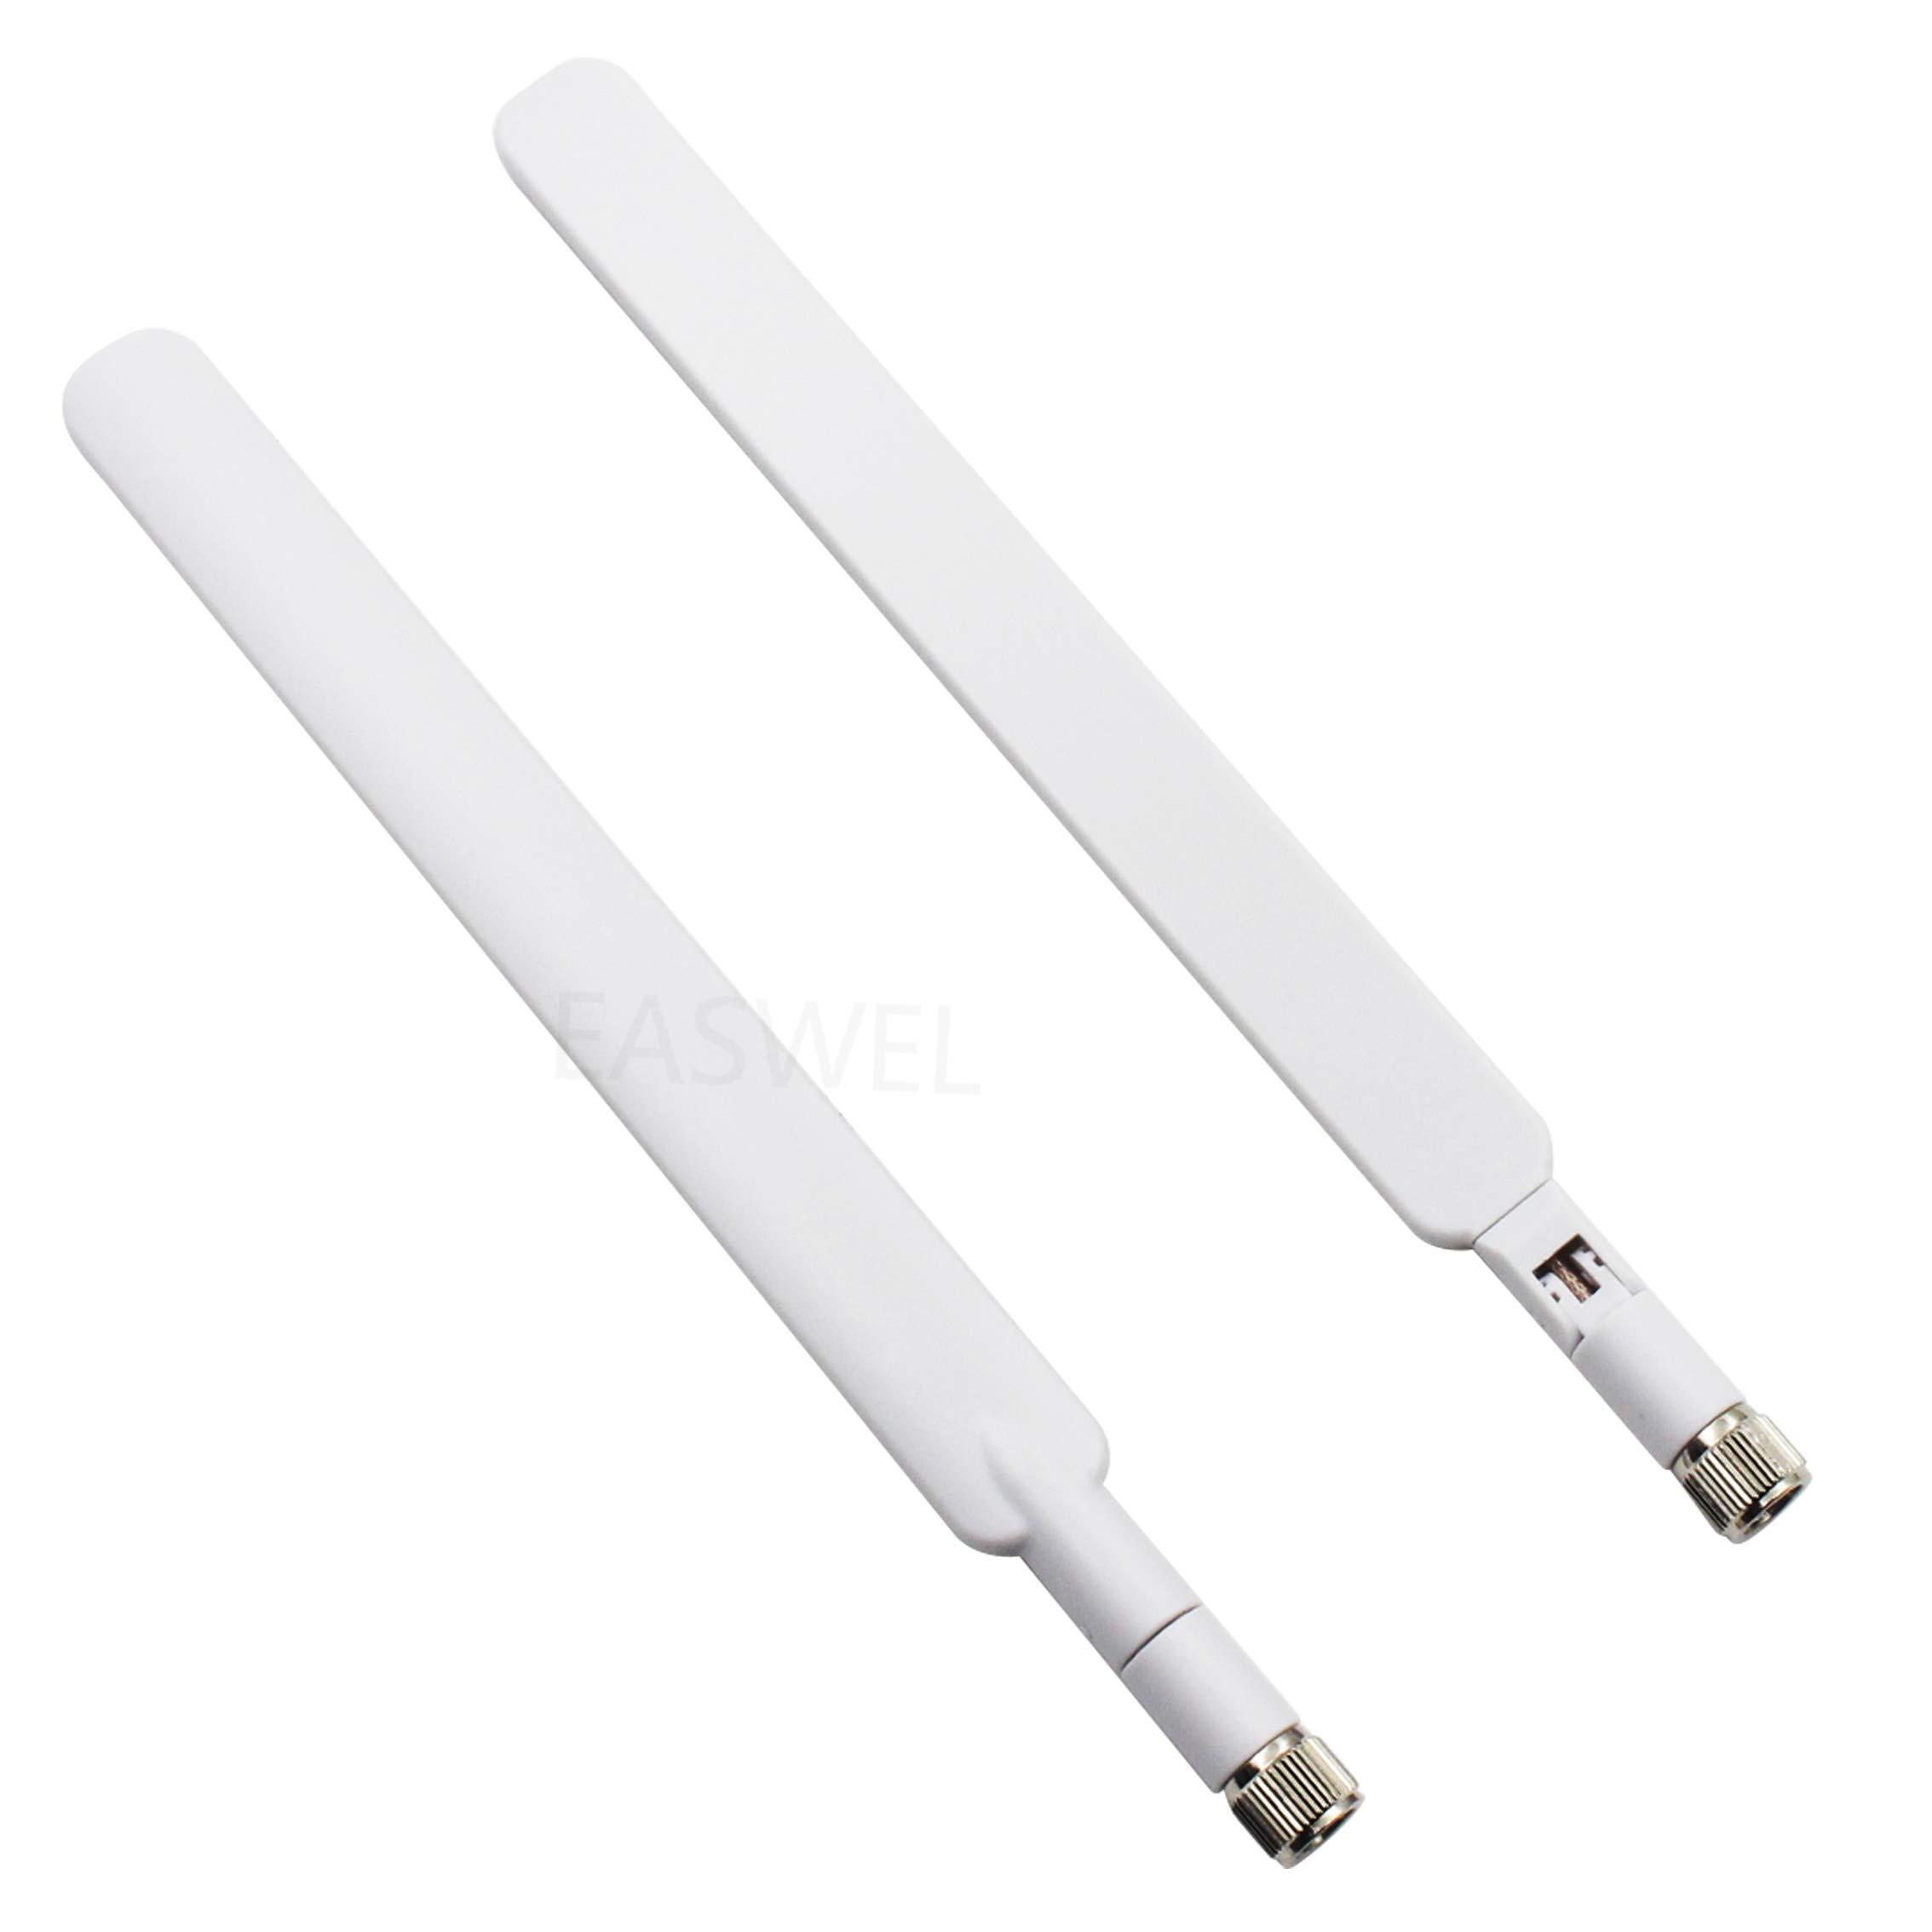 2pcs 4G LTE External Antenna SMA Connector For B593 Wireless Gateway HUAWEI